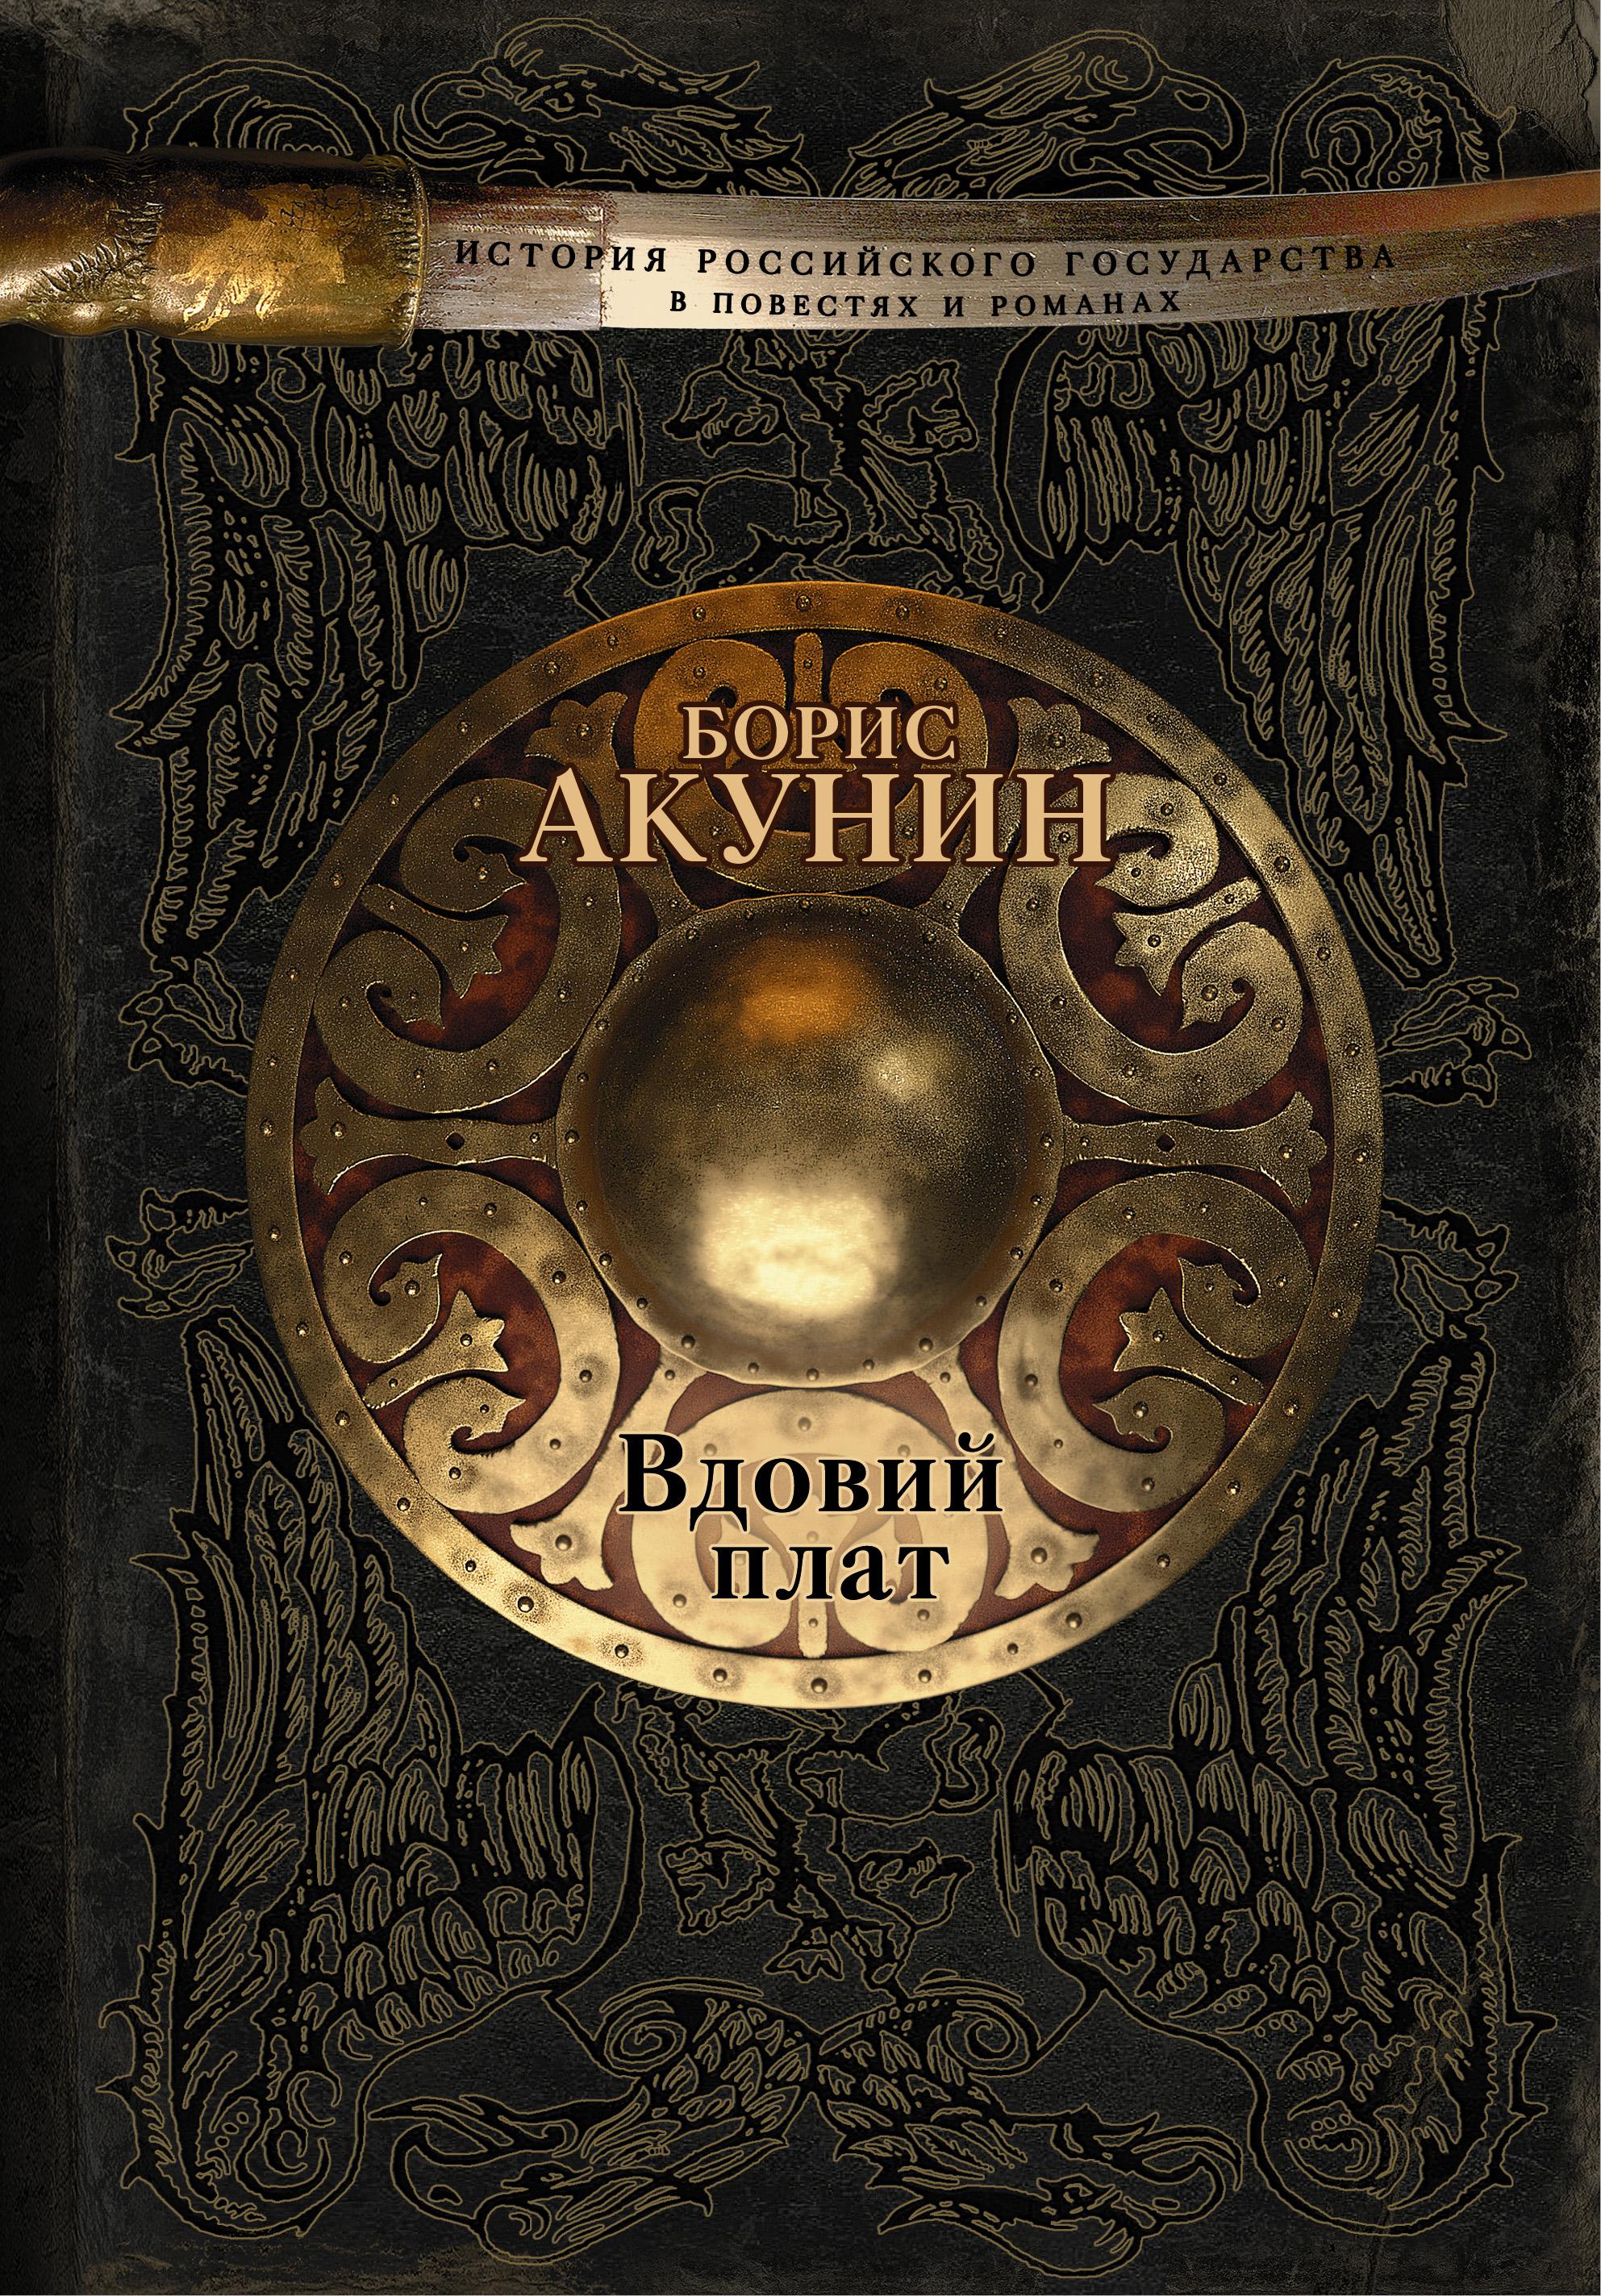 Борис Акунин Вдовий плат (сборник) борис акунин вдовий плат роман